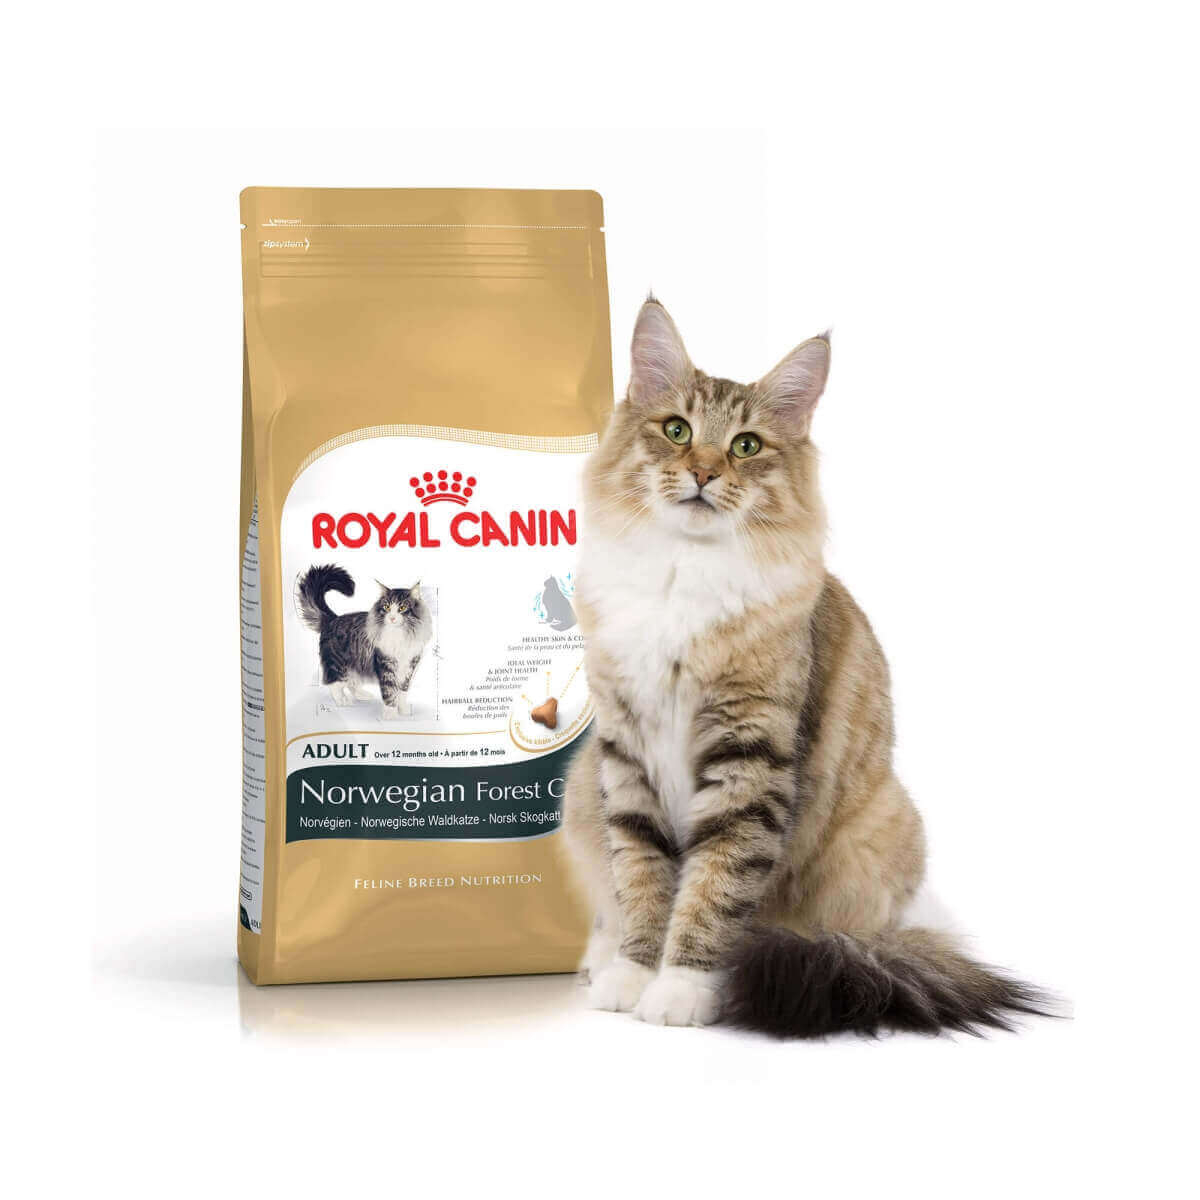 royal canin norvegian cat adult croquettes chat. Black Bedroom Furniture Sets. Home Design Ideas